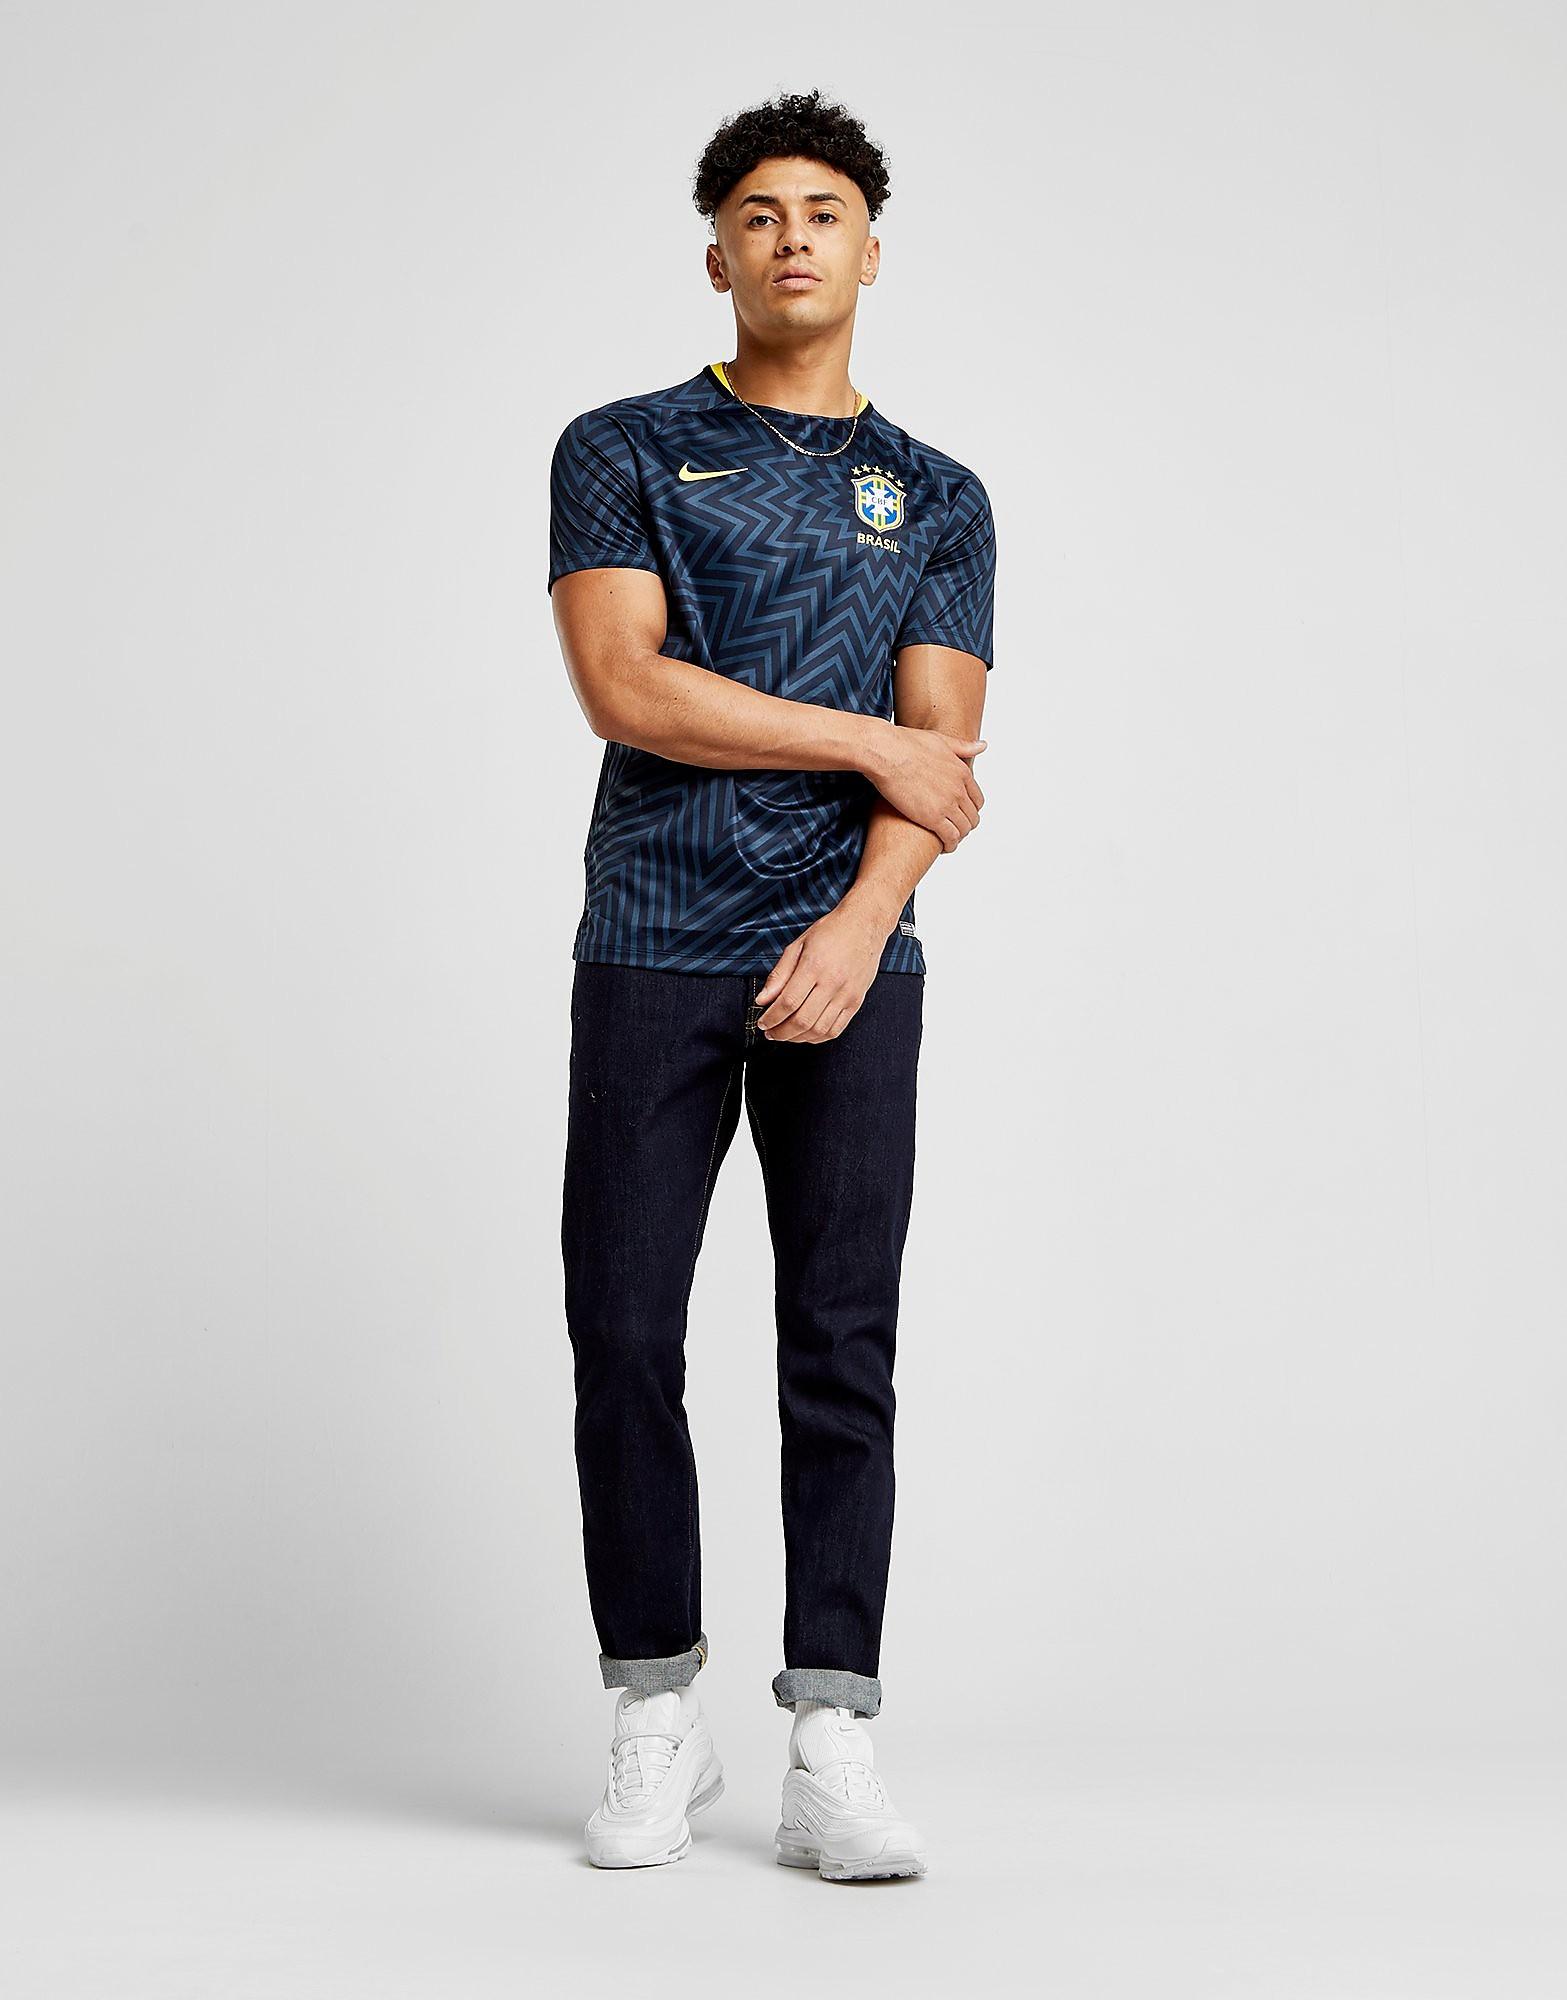 Nike Brazil Pre Match Squad Shirt